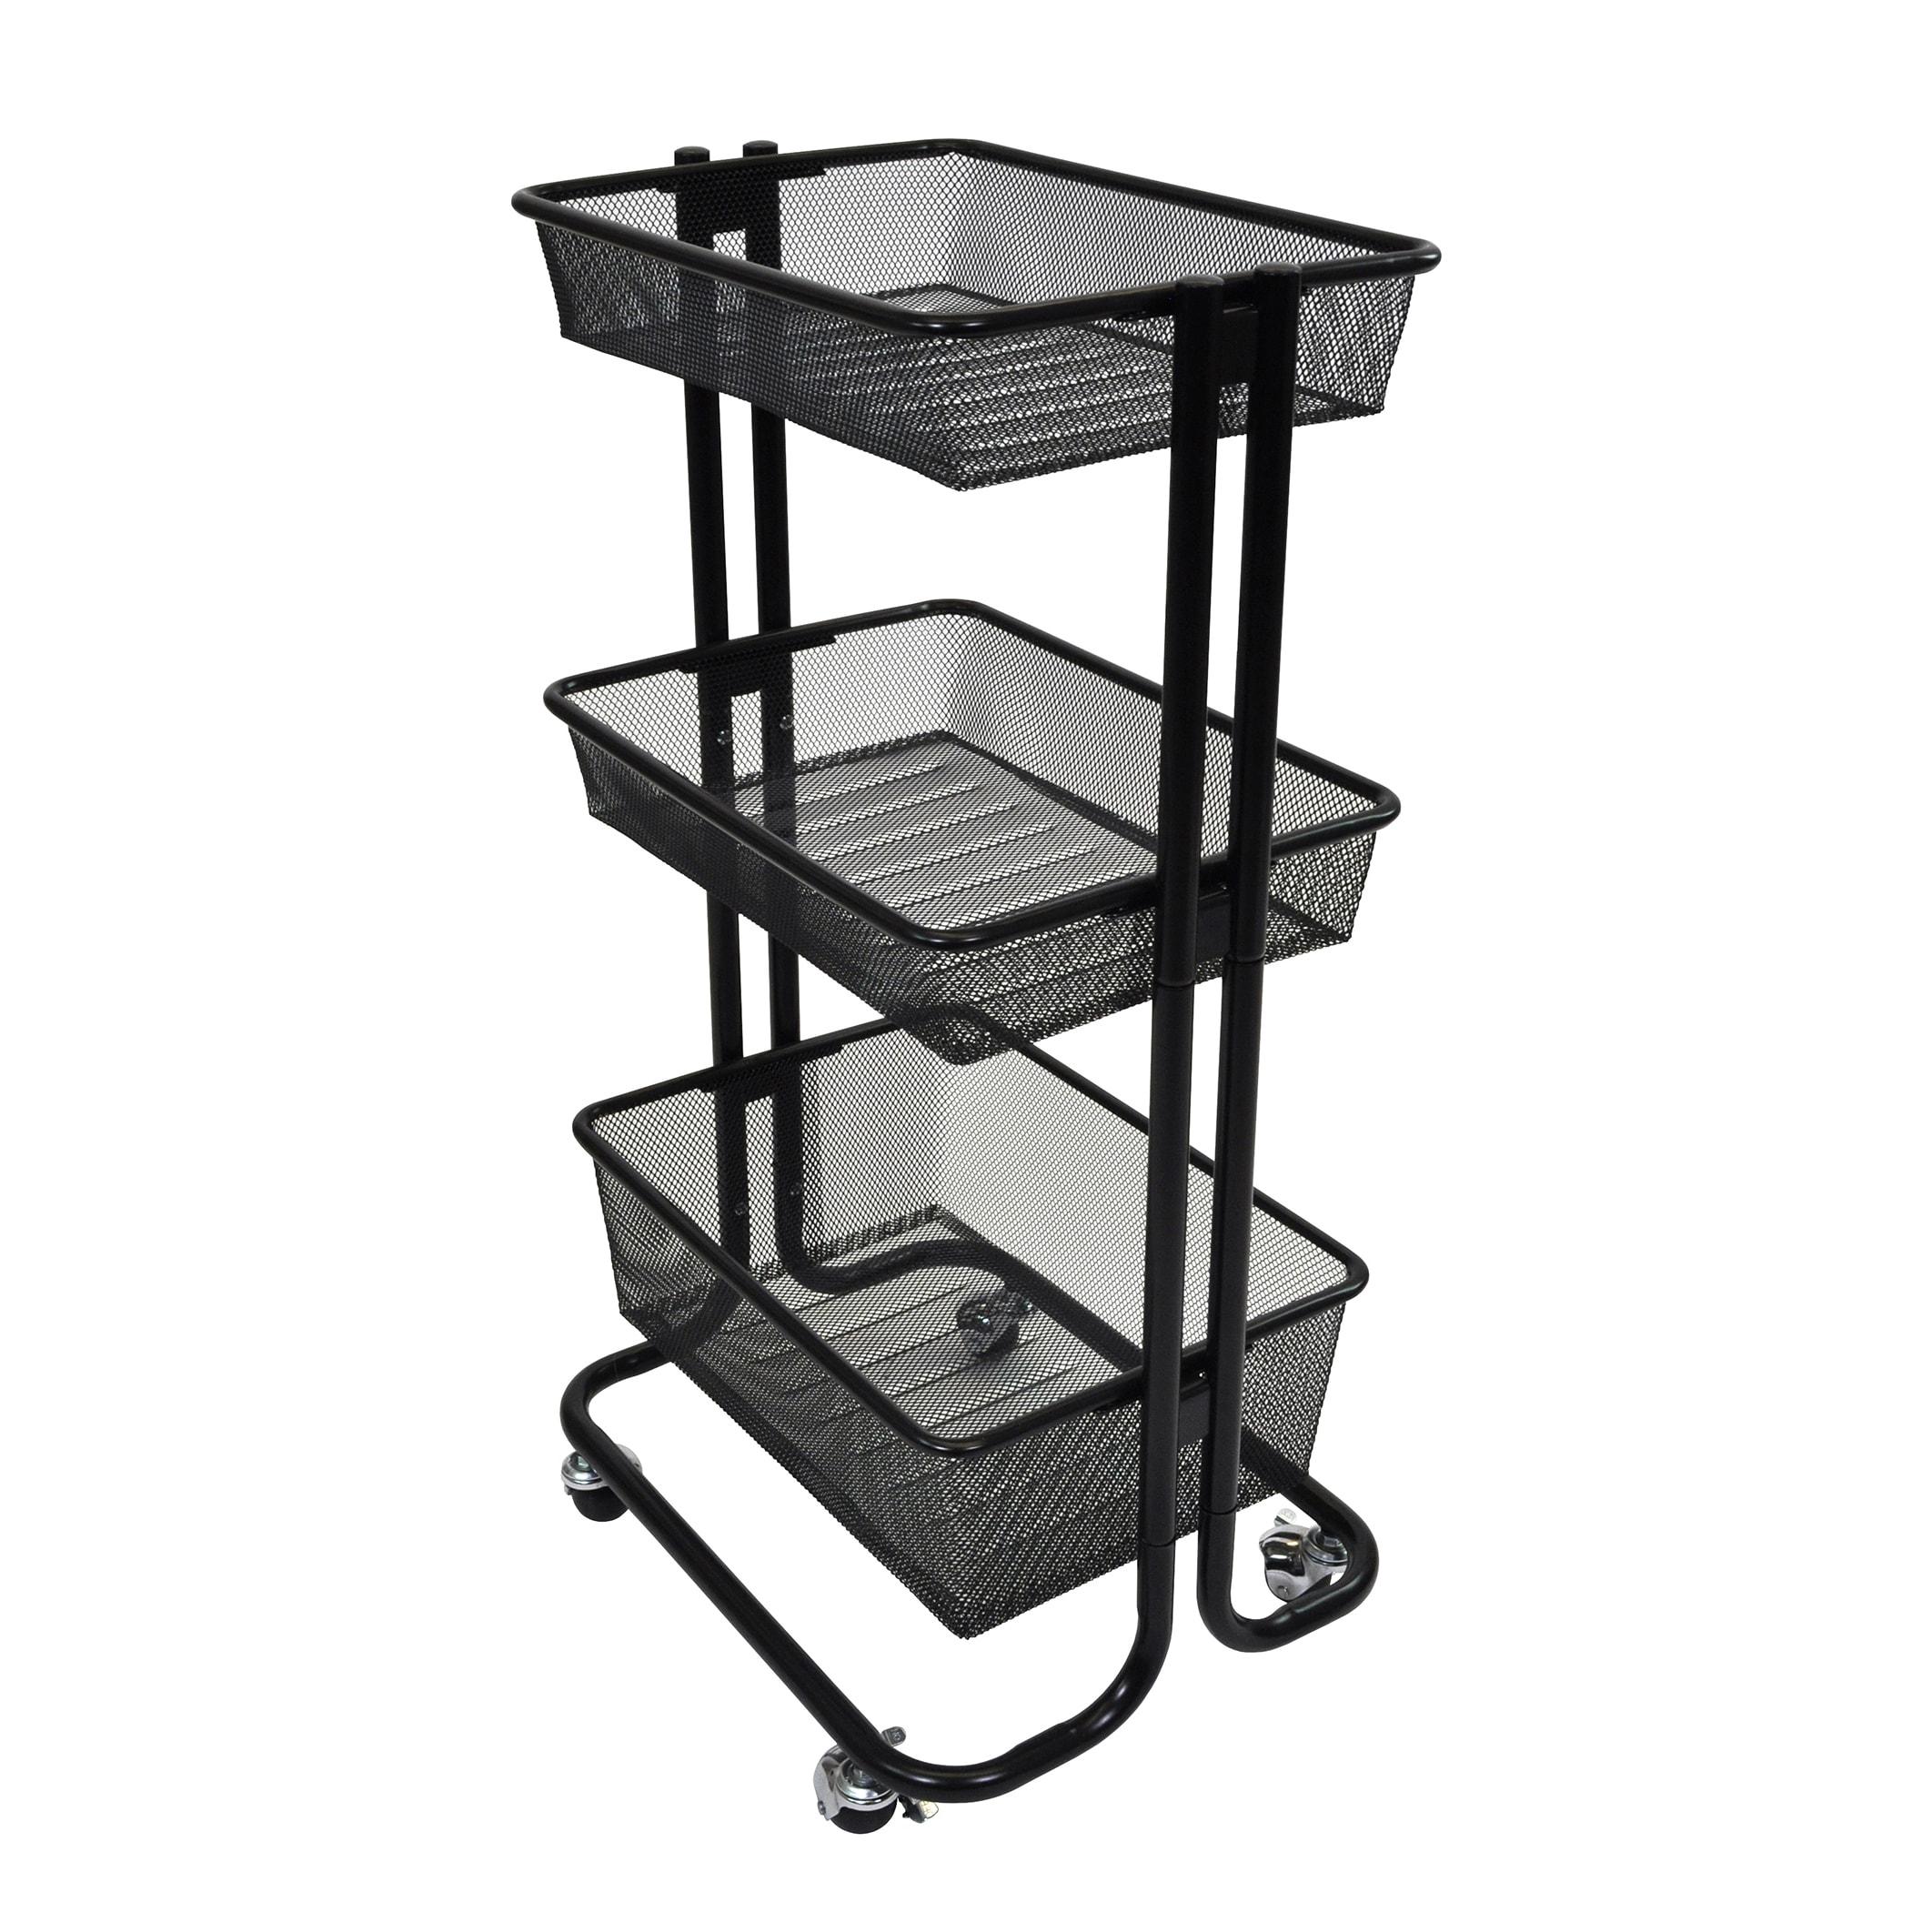 3 Shelves Home Office Classroom Kitchen Storage Multipurpose Utility Cart  Black